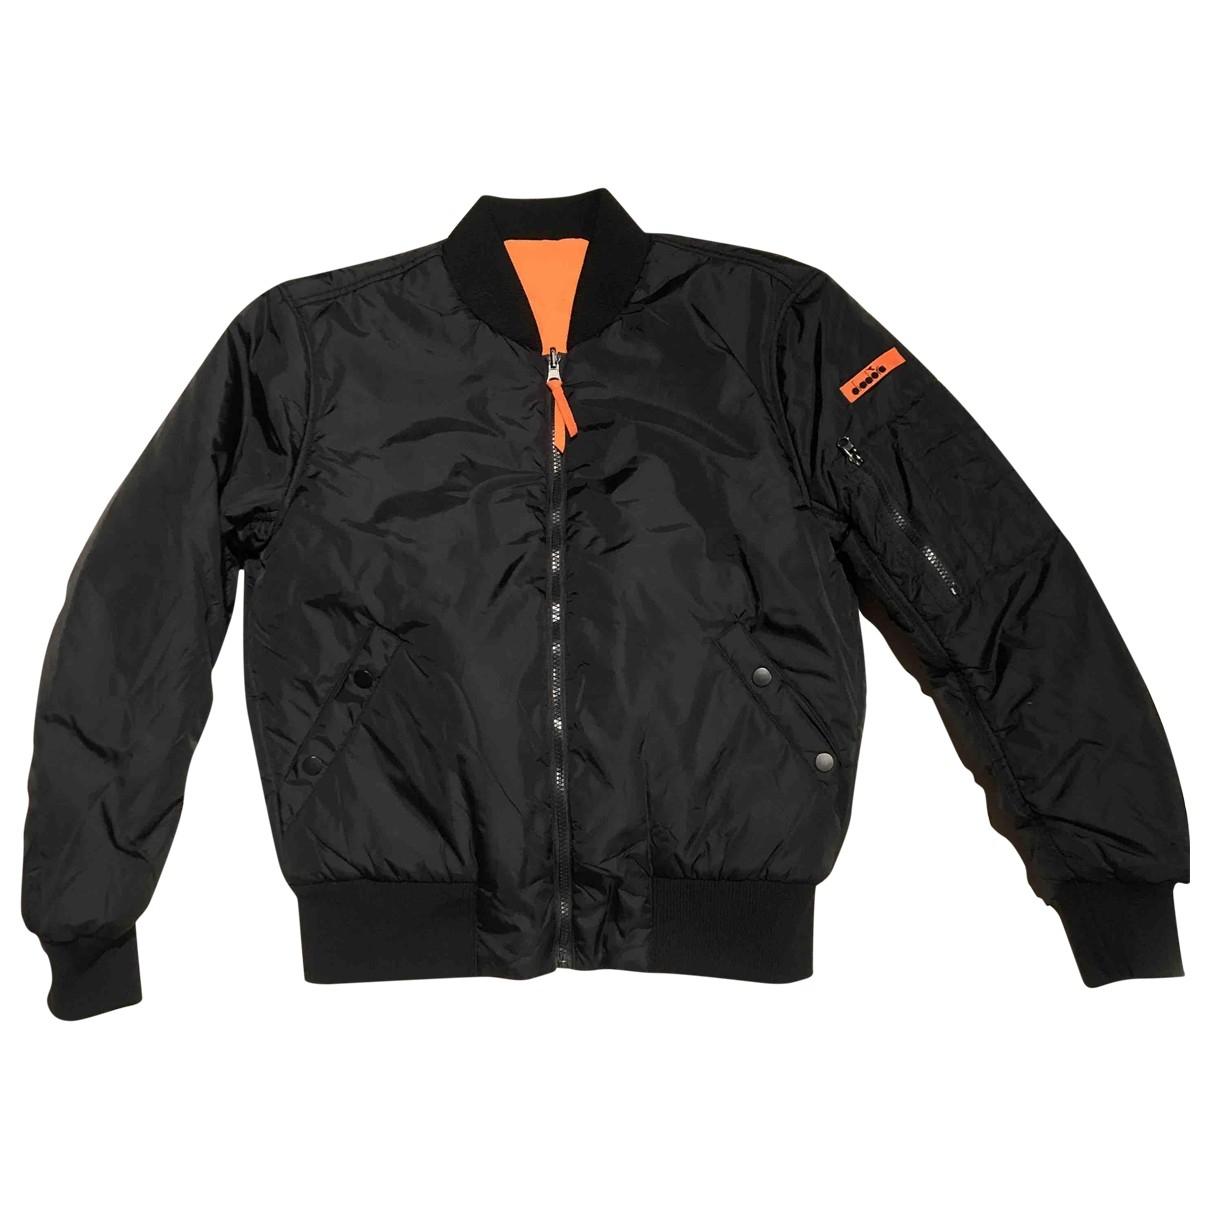 Diadora \N Black jacket  for Men XS International